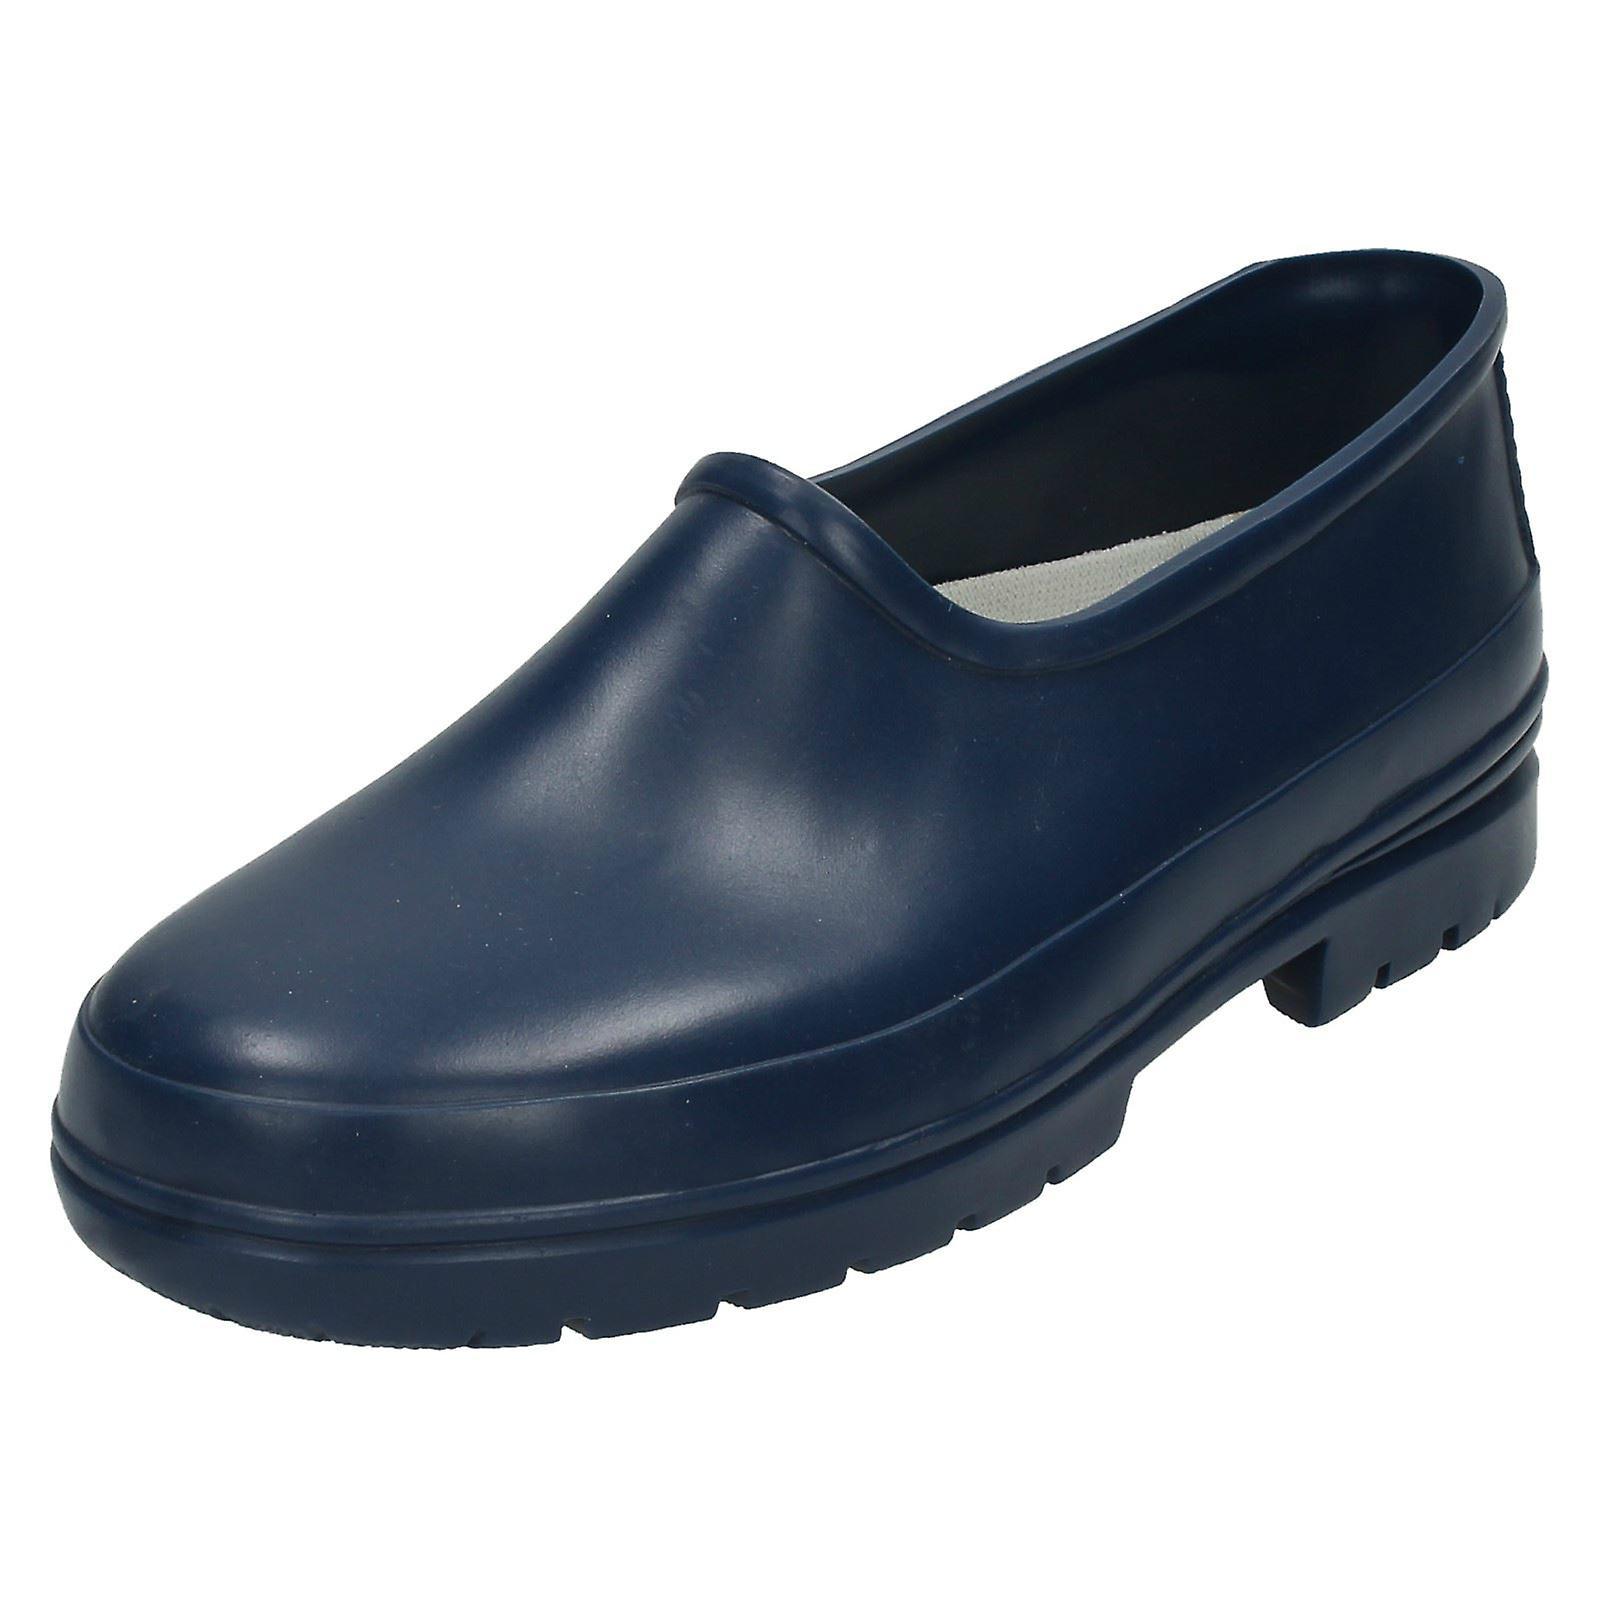 Mens Fleck auf Garten Schuhe